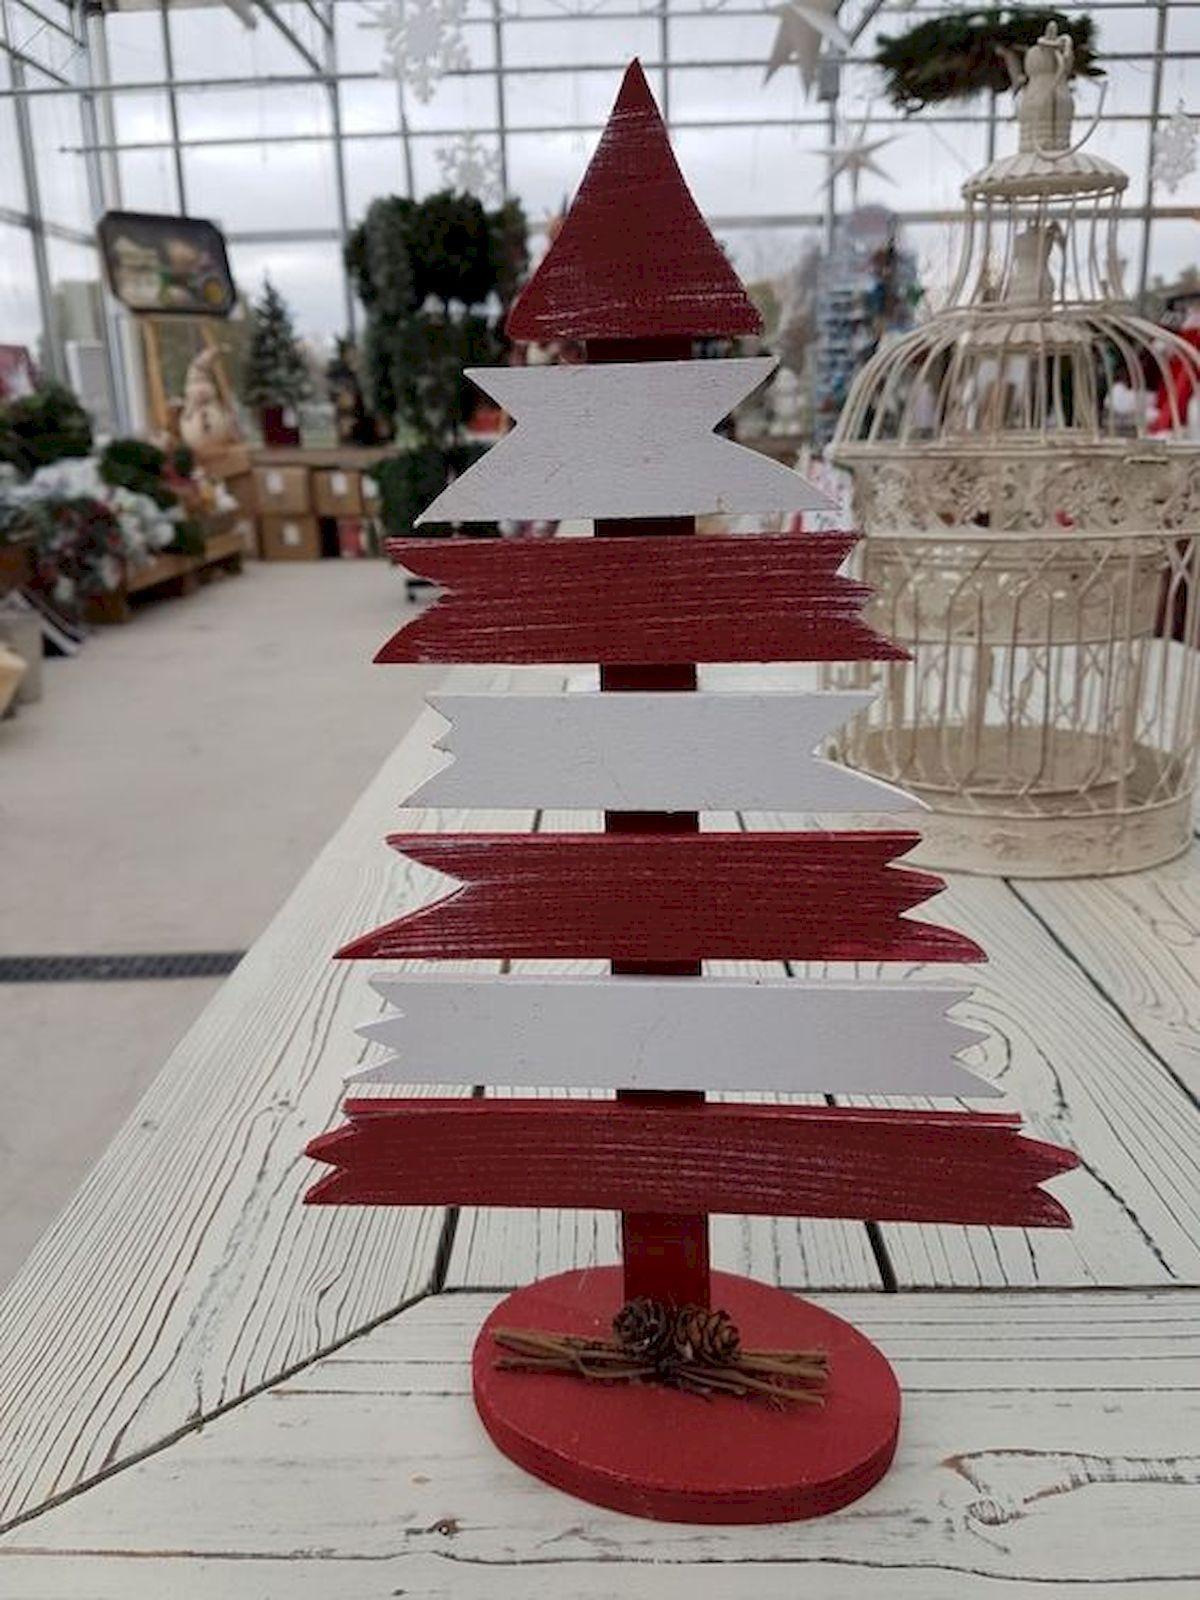 30 Rustic And Vintage Christmas Tree Decor Ideas